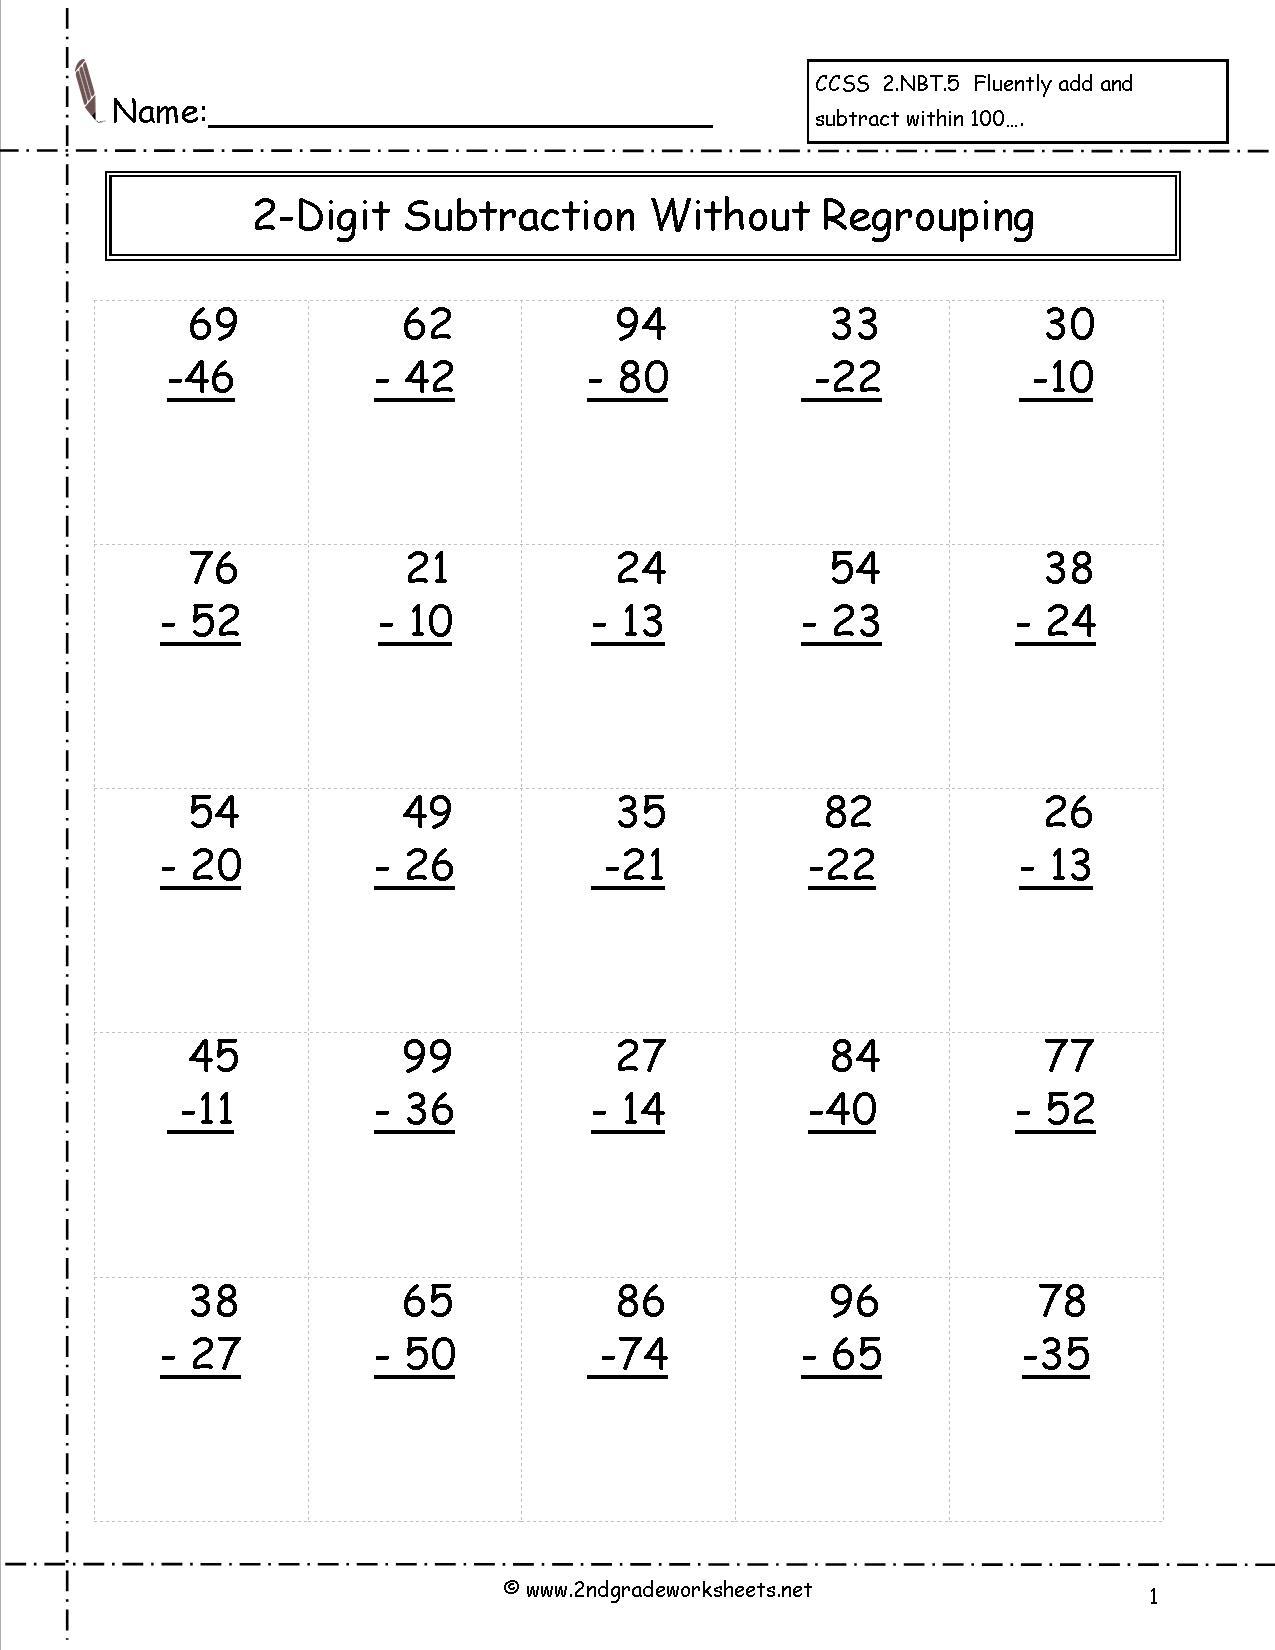 2 Digit Borrow Subtraction Regrouping Beginner